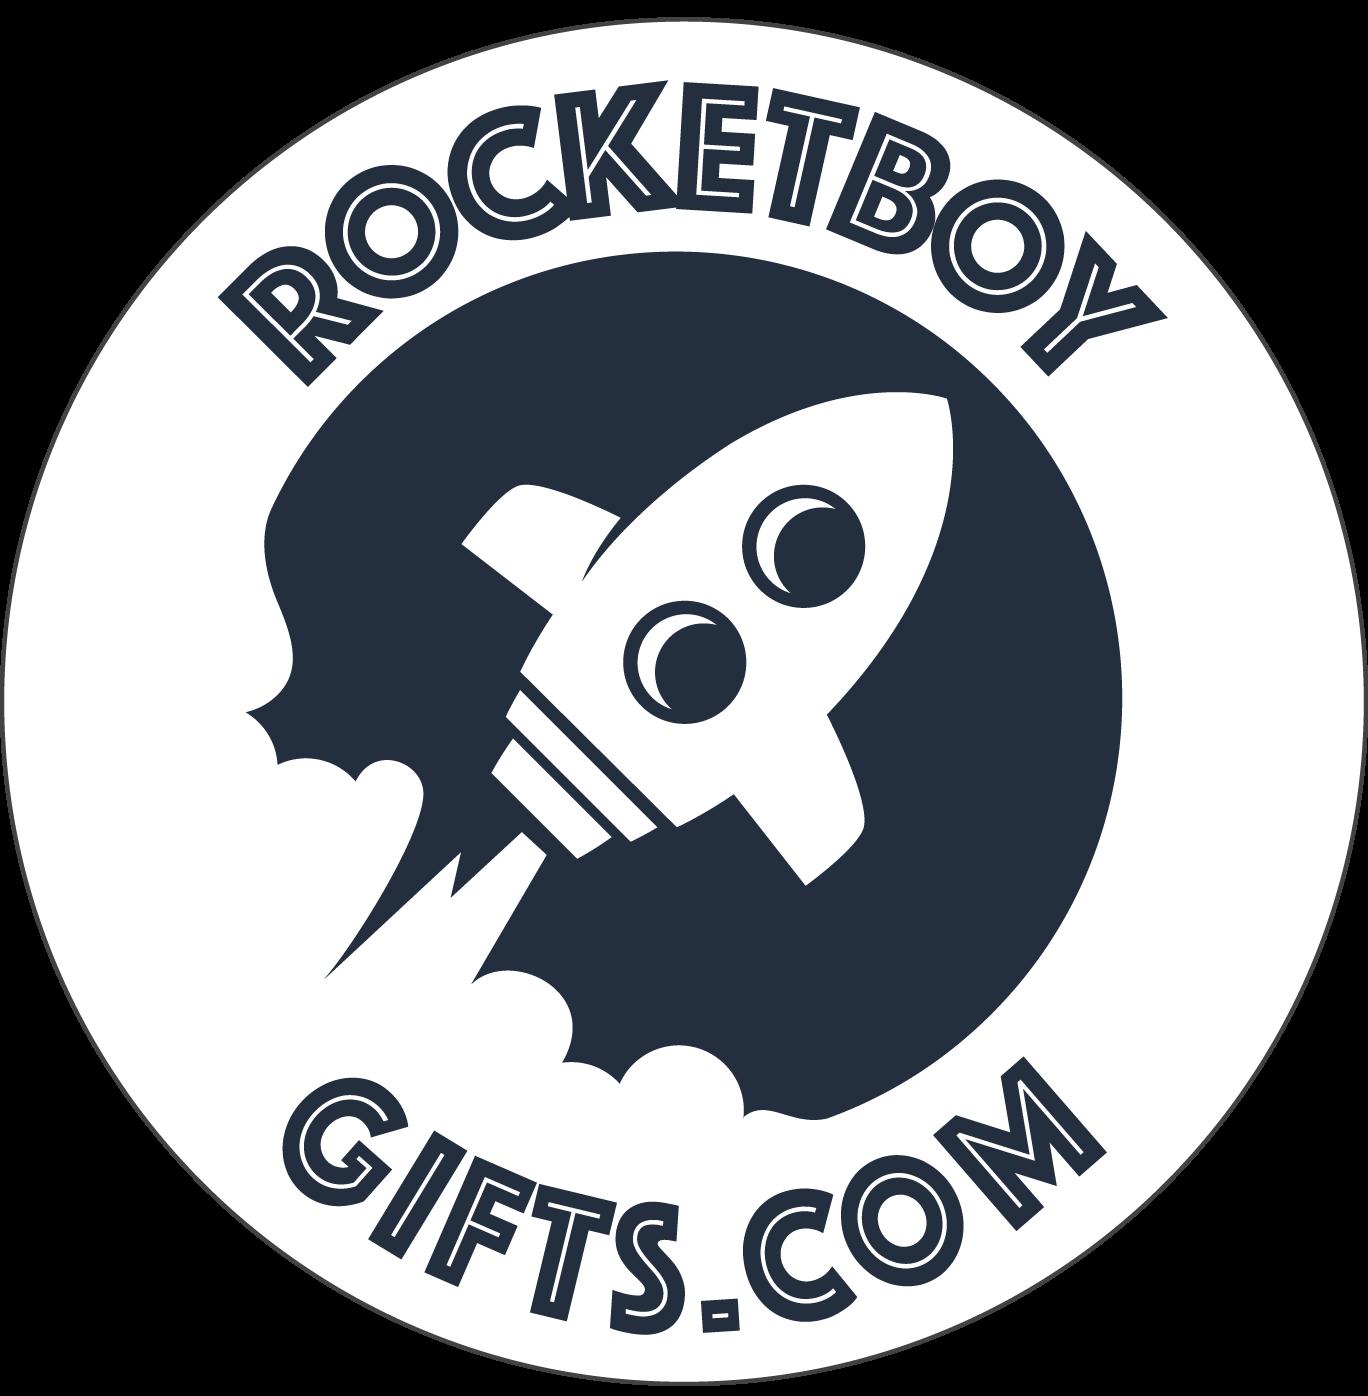 Rocketboy Gifts